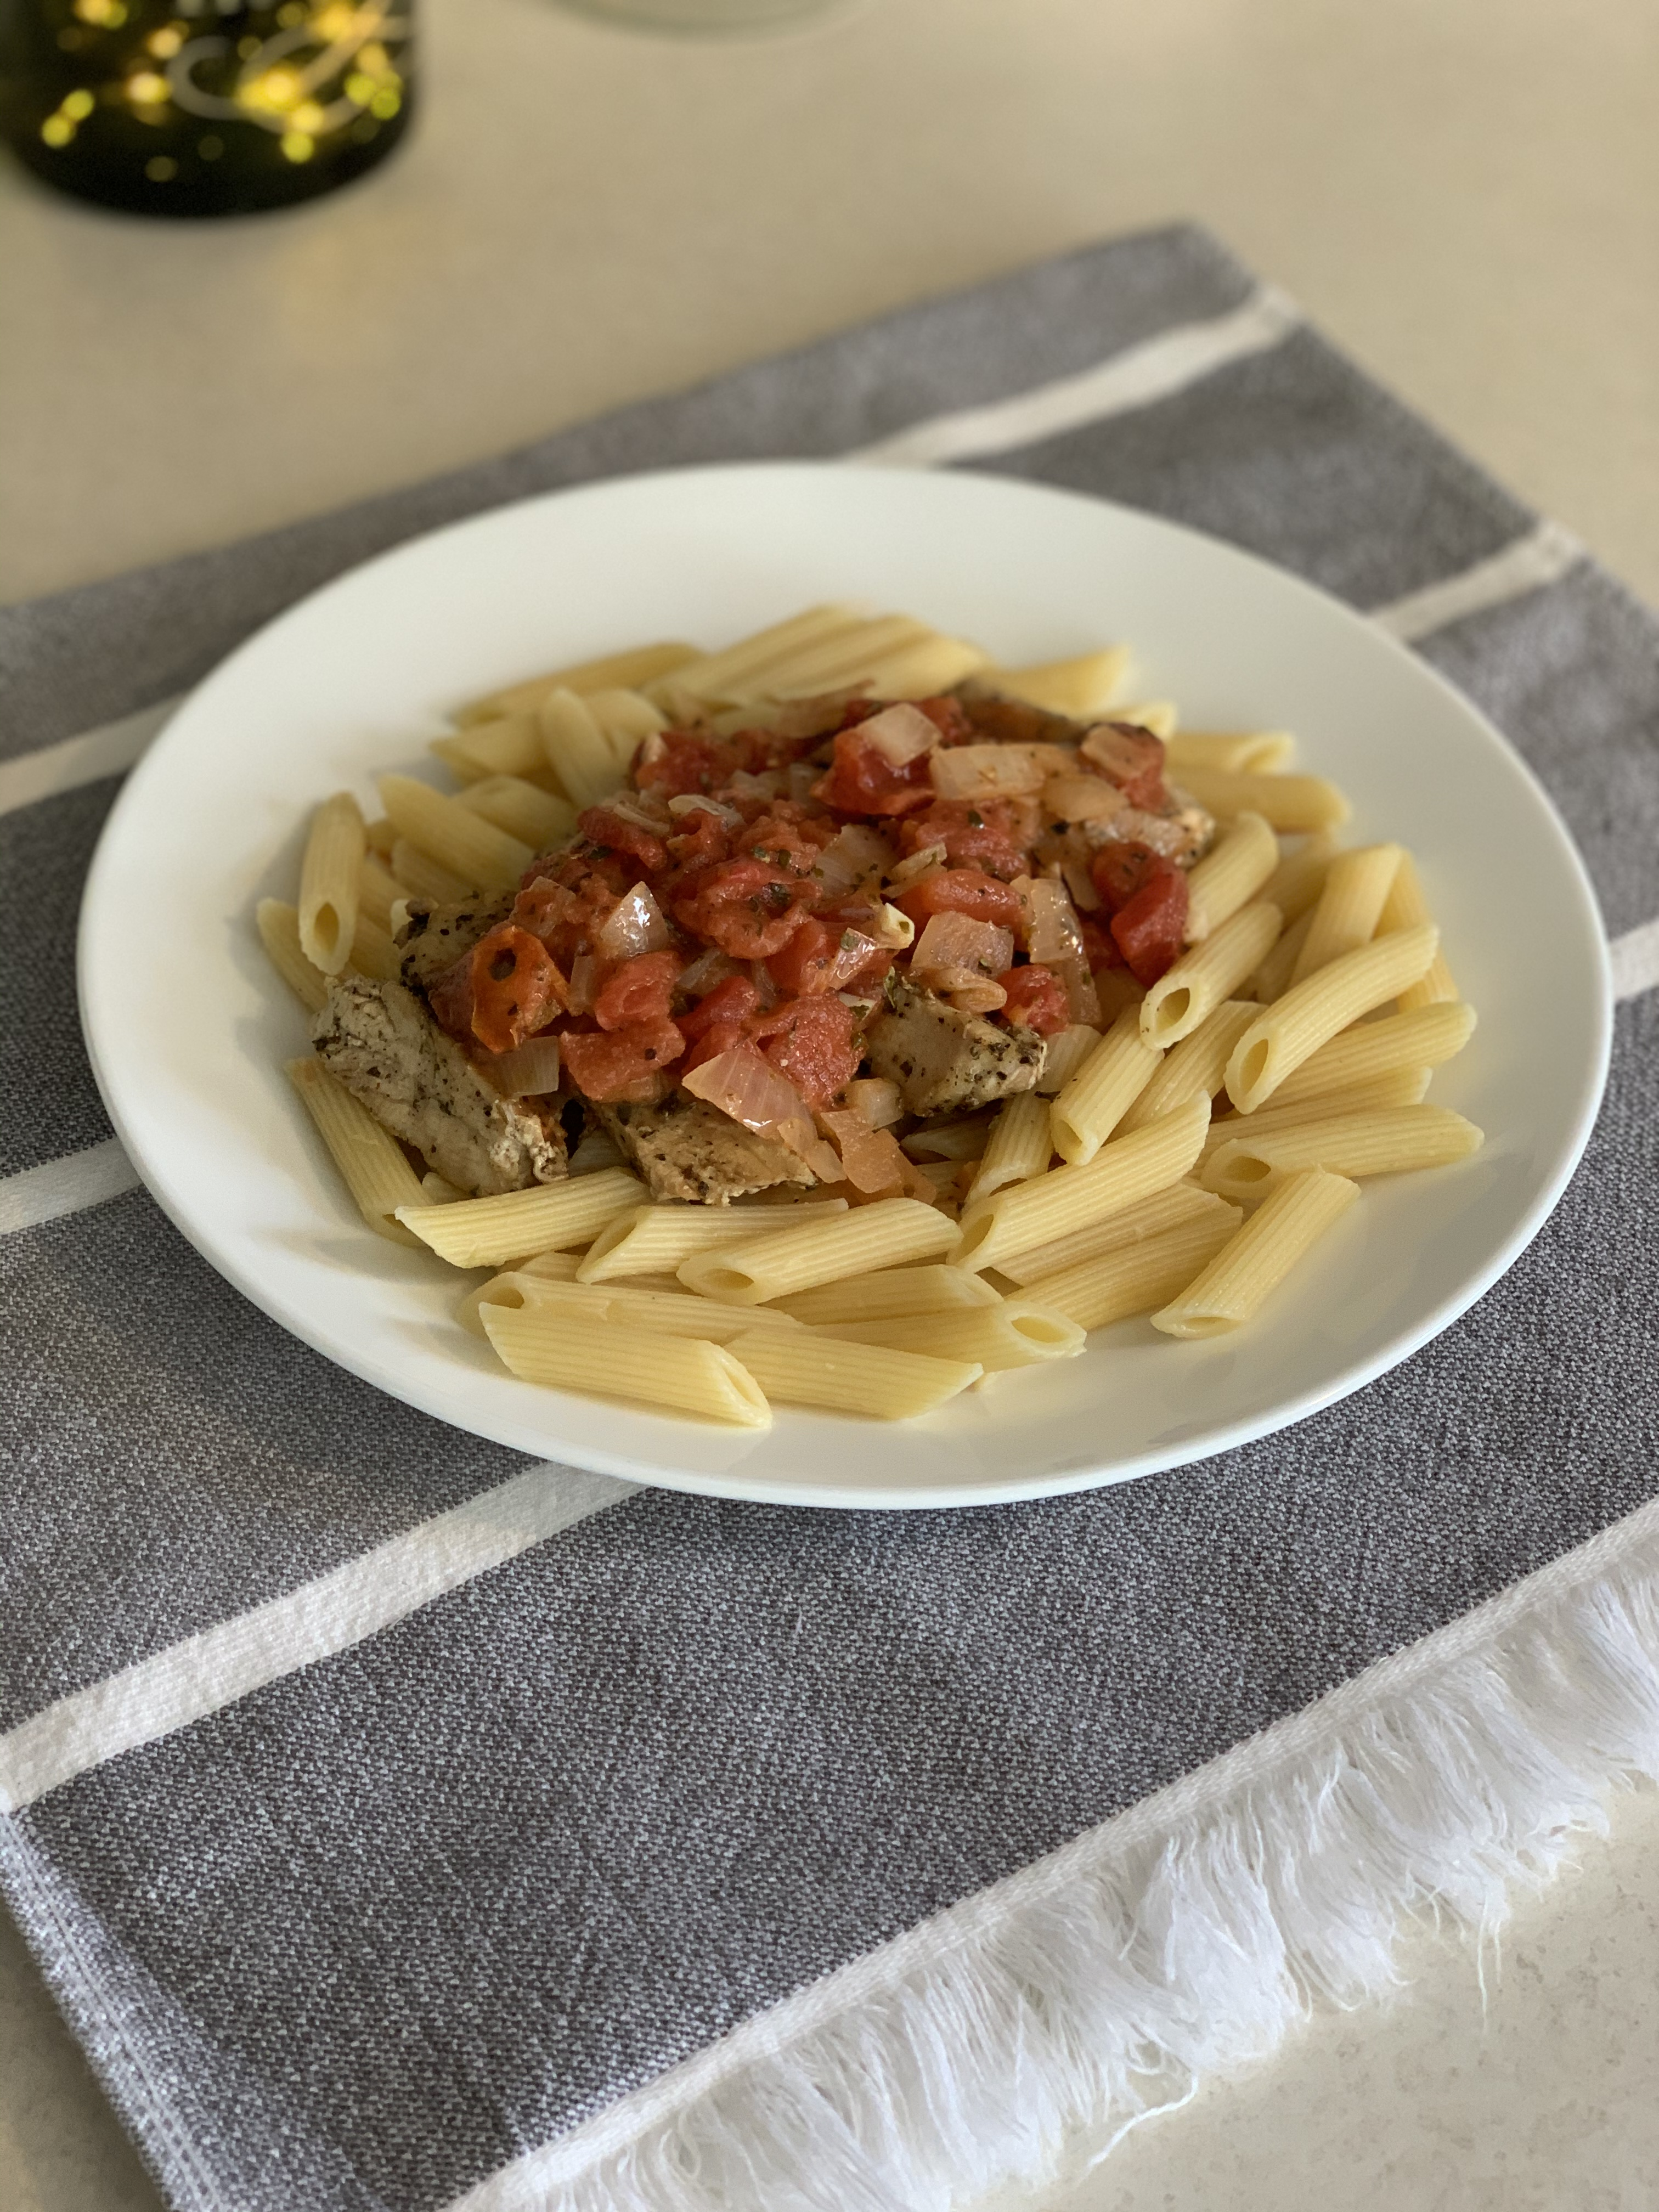 Tomato-Cream Sauce for Pasta Amy B